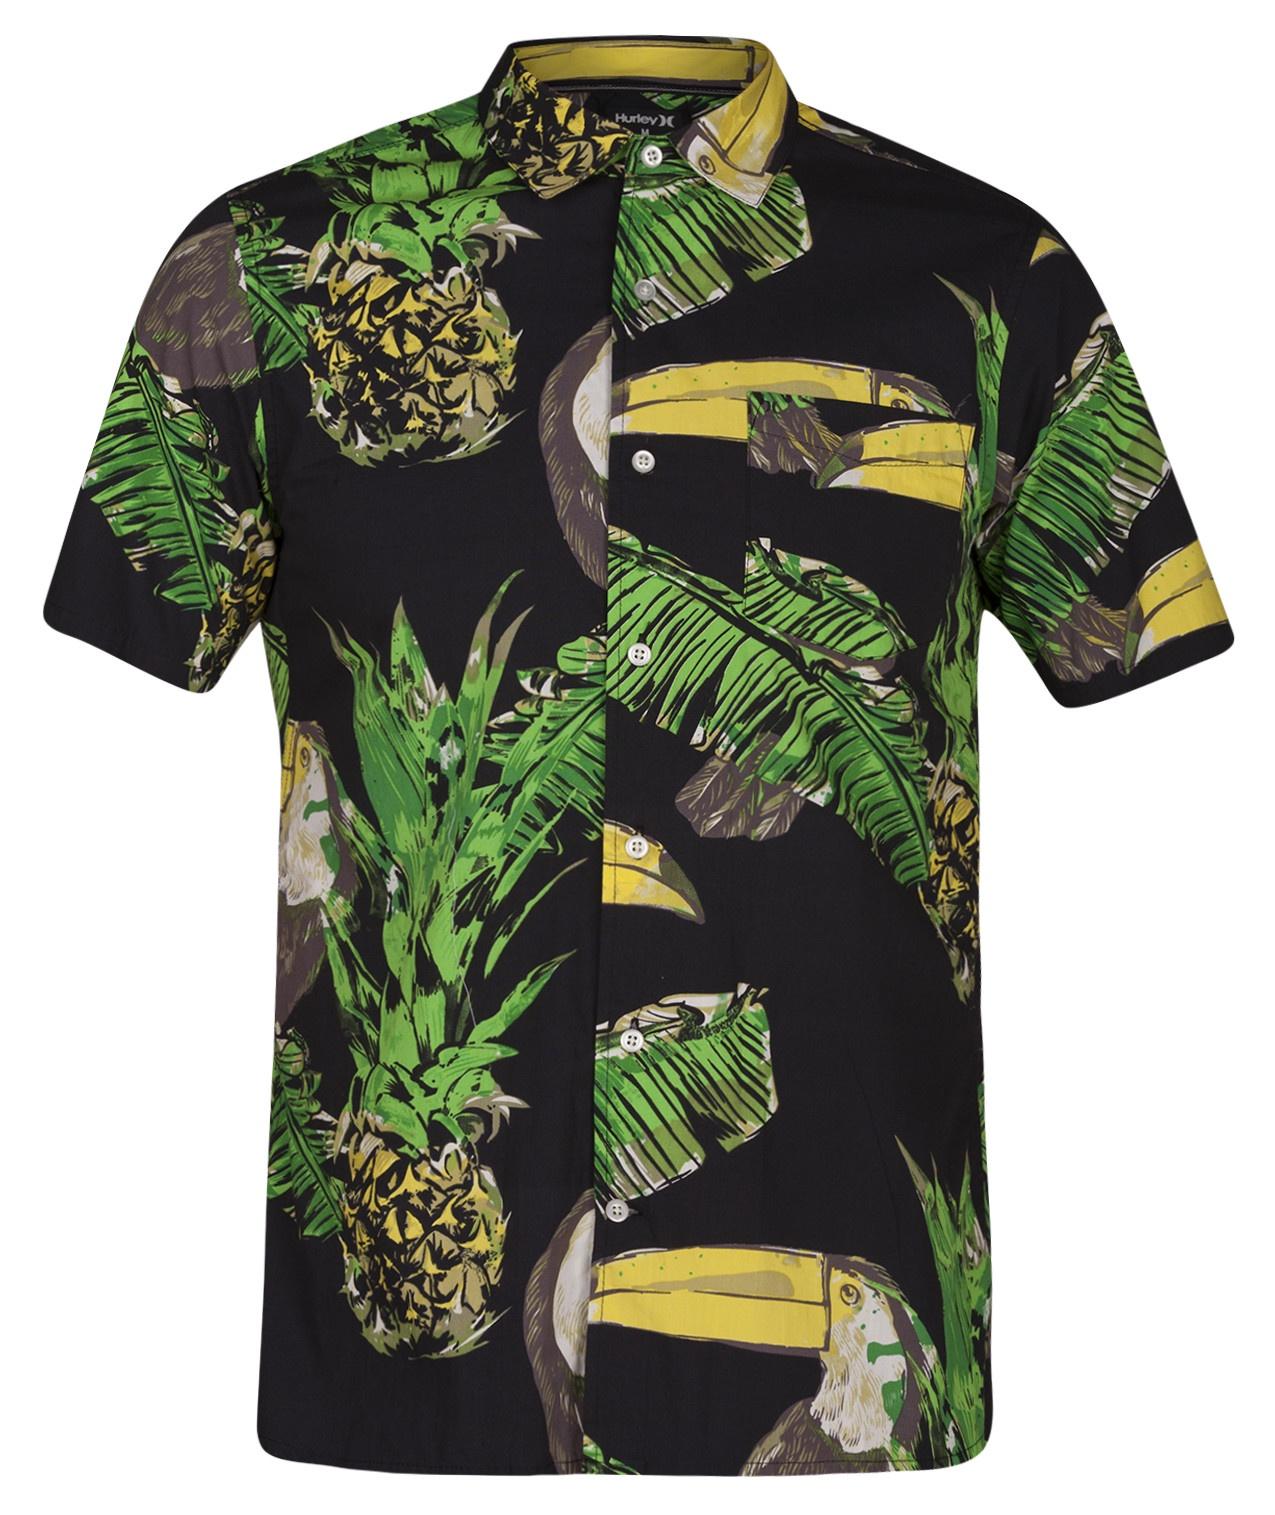 Жакет Hurley футболка мужская salomon cosmic crew ss tee m цвет бирюзовый l40094500 размер xxl 54